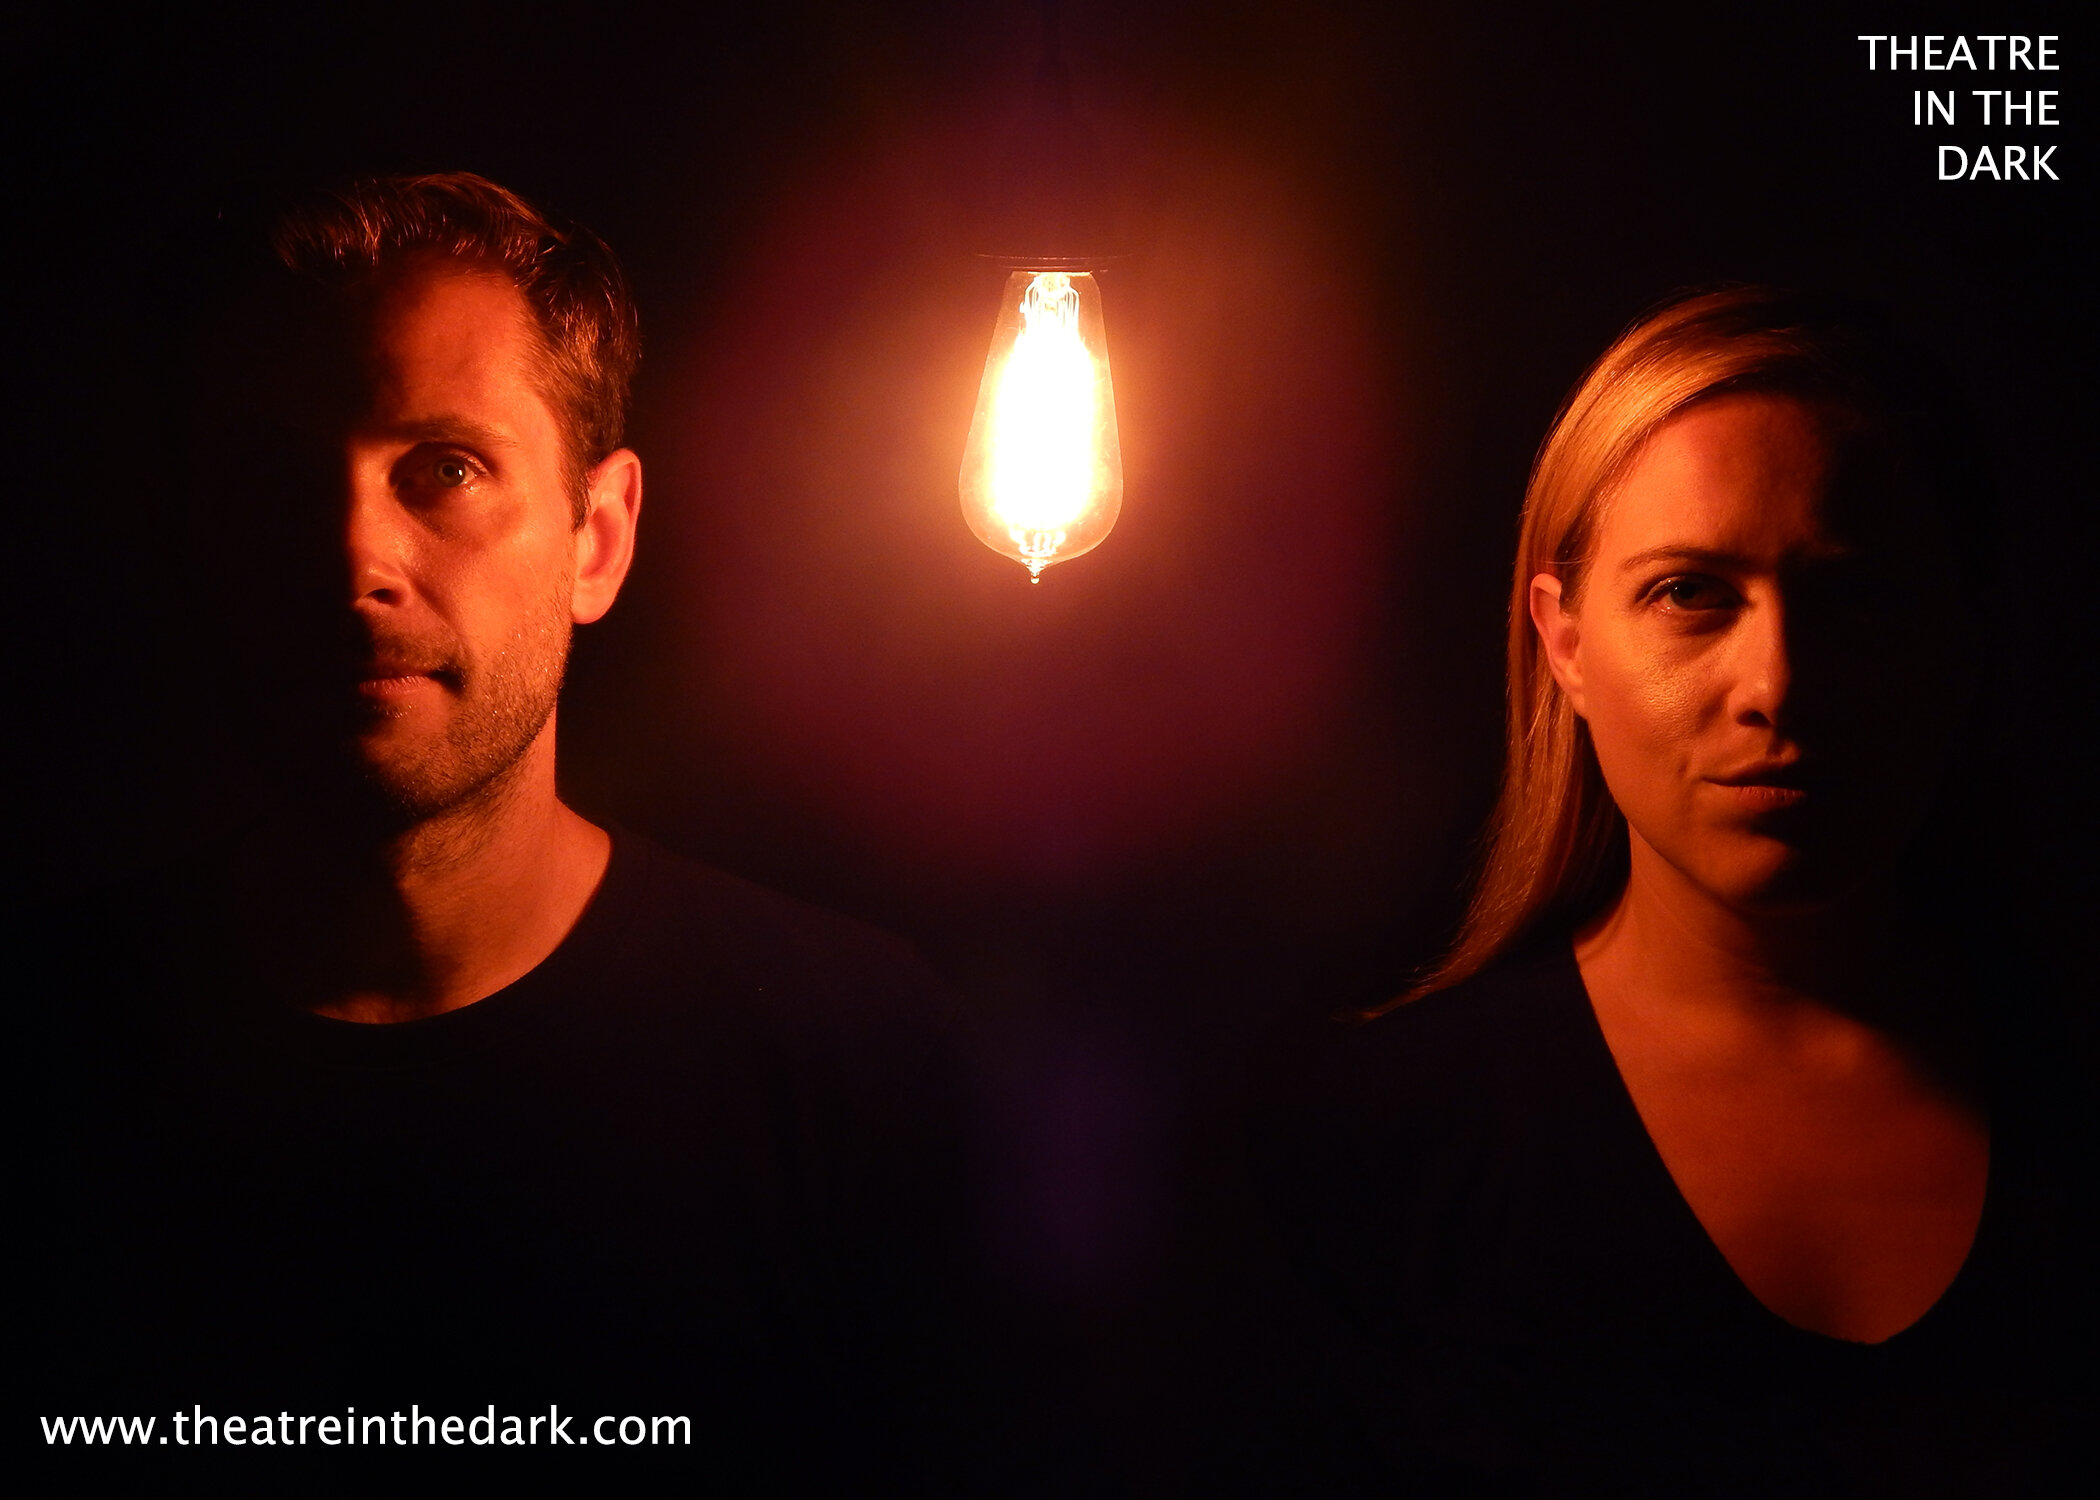 Featured performers: Mackenzie Gordon (L) and Bethany Arrington (R). Photo: Zachary Parkhurst.